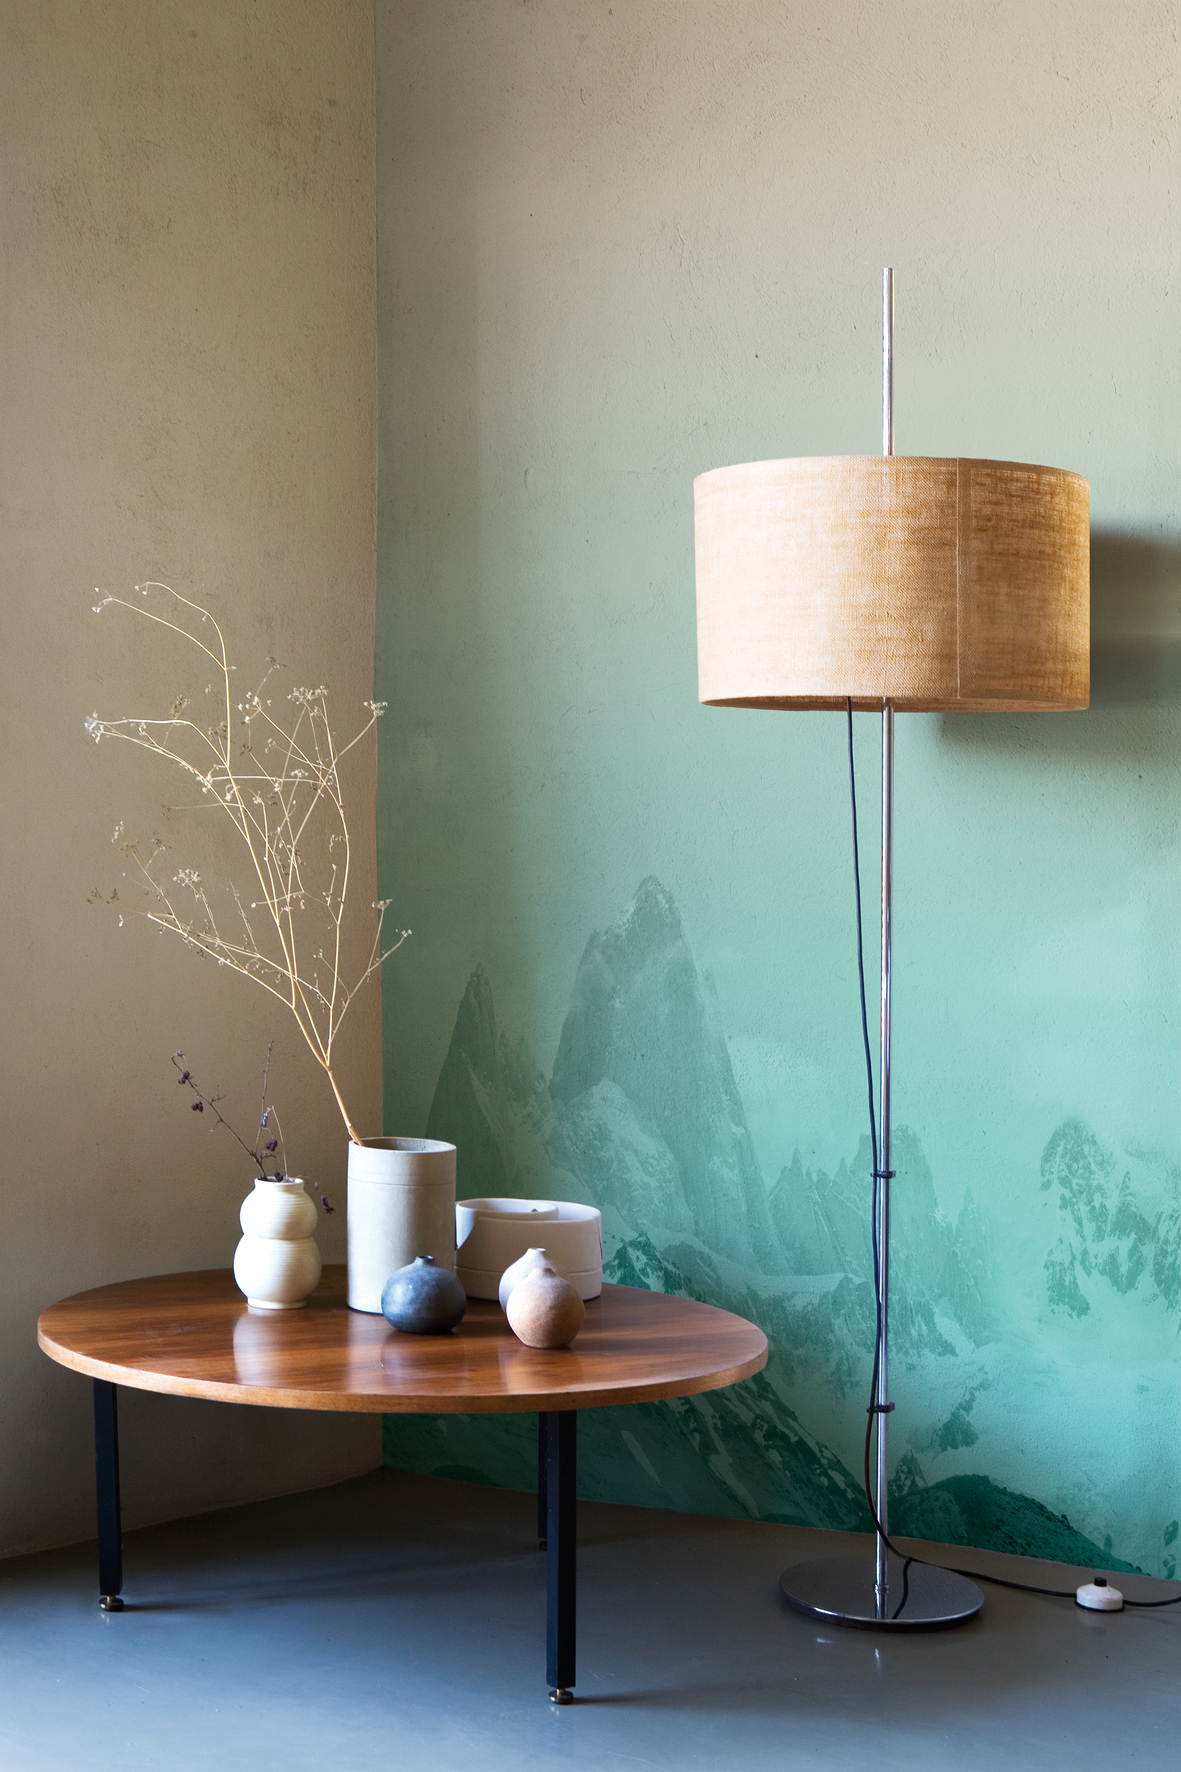 panoramic wallpaper picos do mundo life 13 collection by wall dec design serena confalonieri. Black Bedroom Furniture Sets. Home Design Ideas